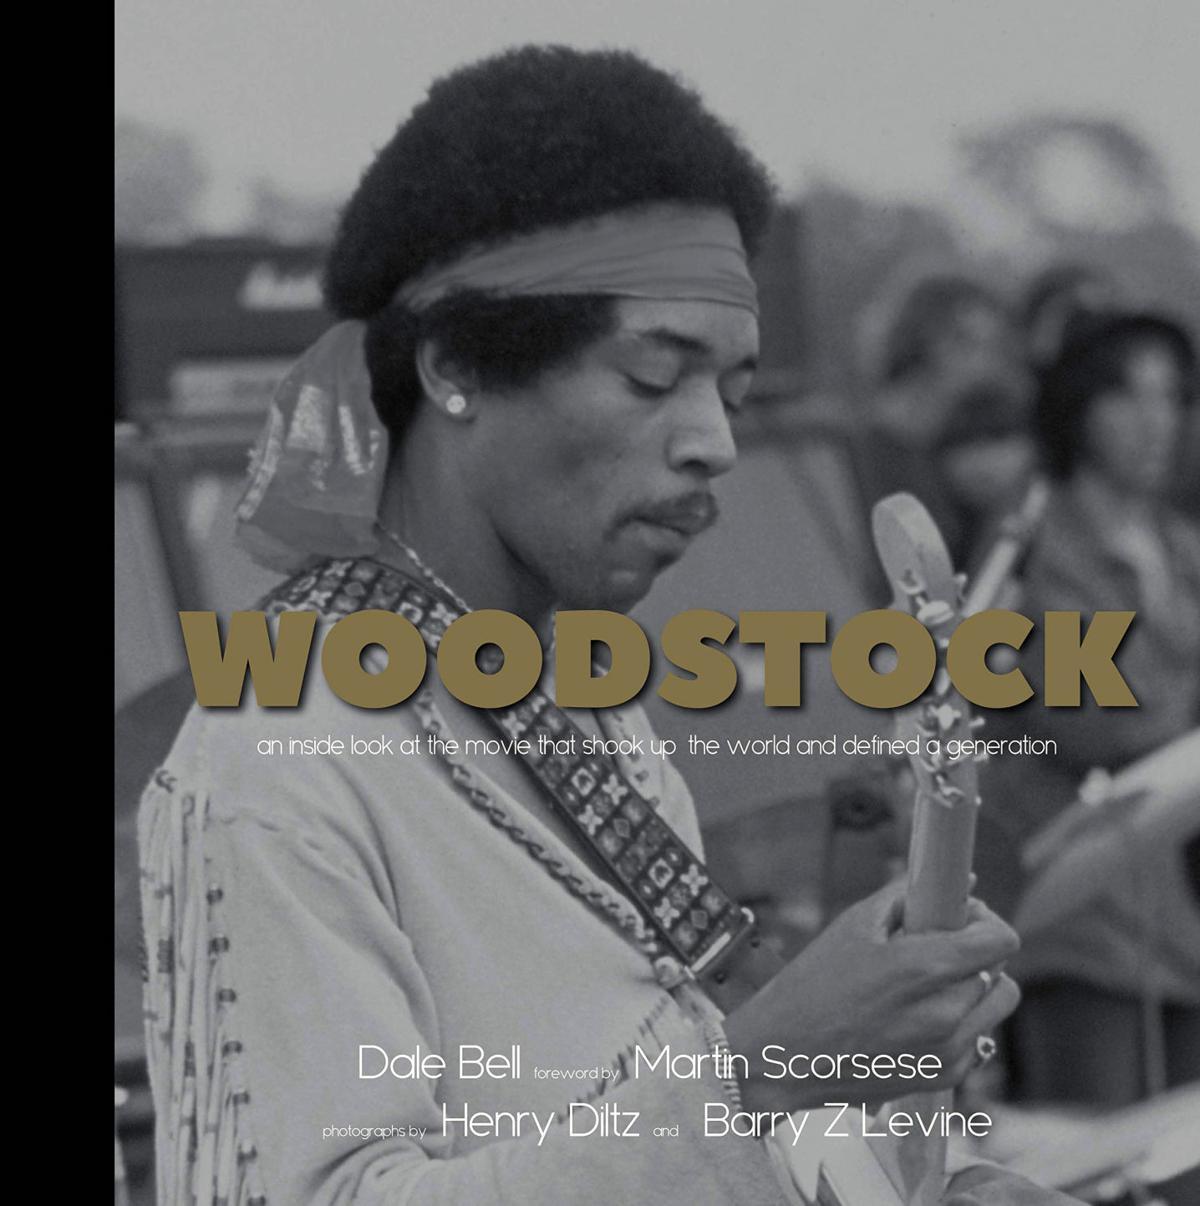 woodstockp3